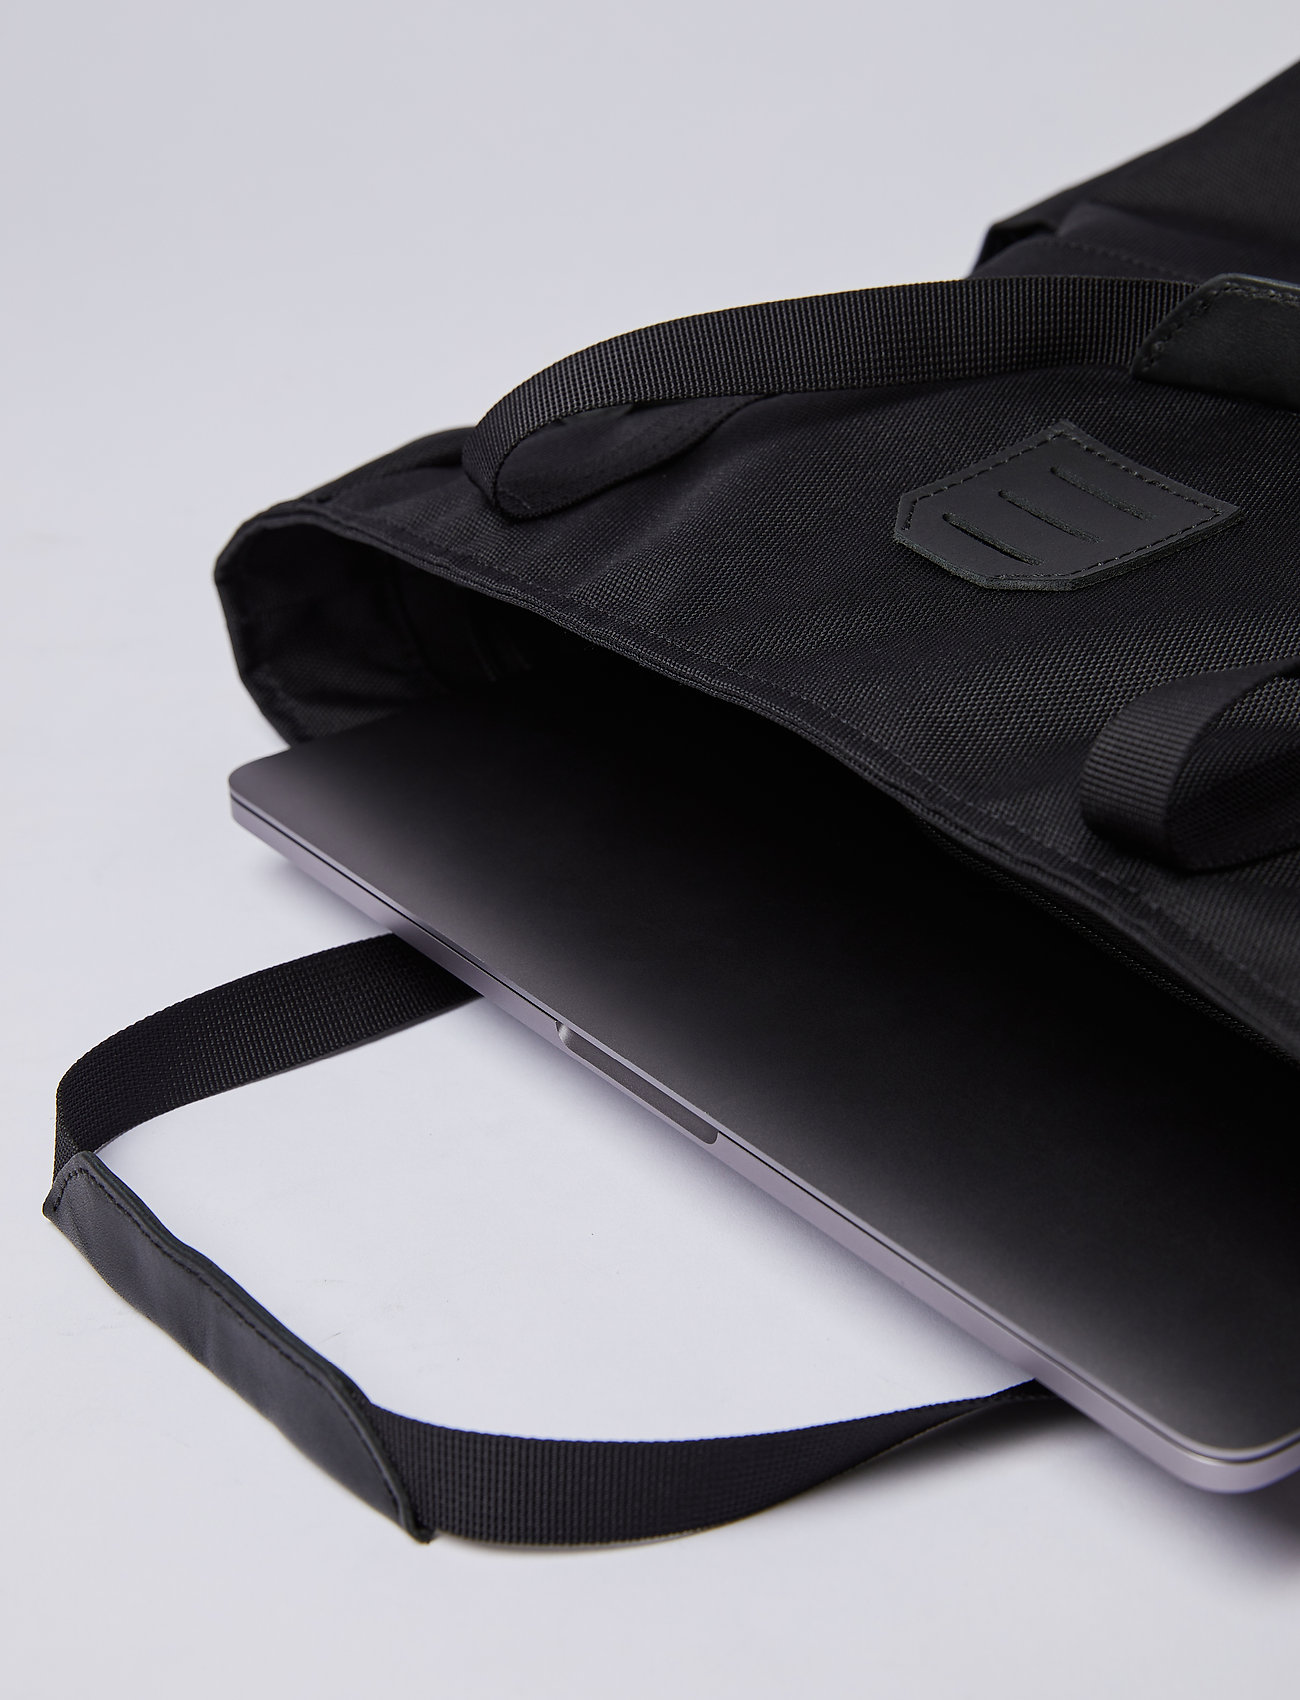 Roger (Black With Black Leather) (129 €) - SANDQVIST Bwxib